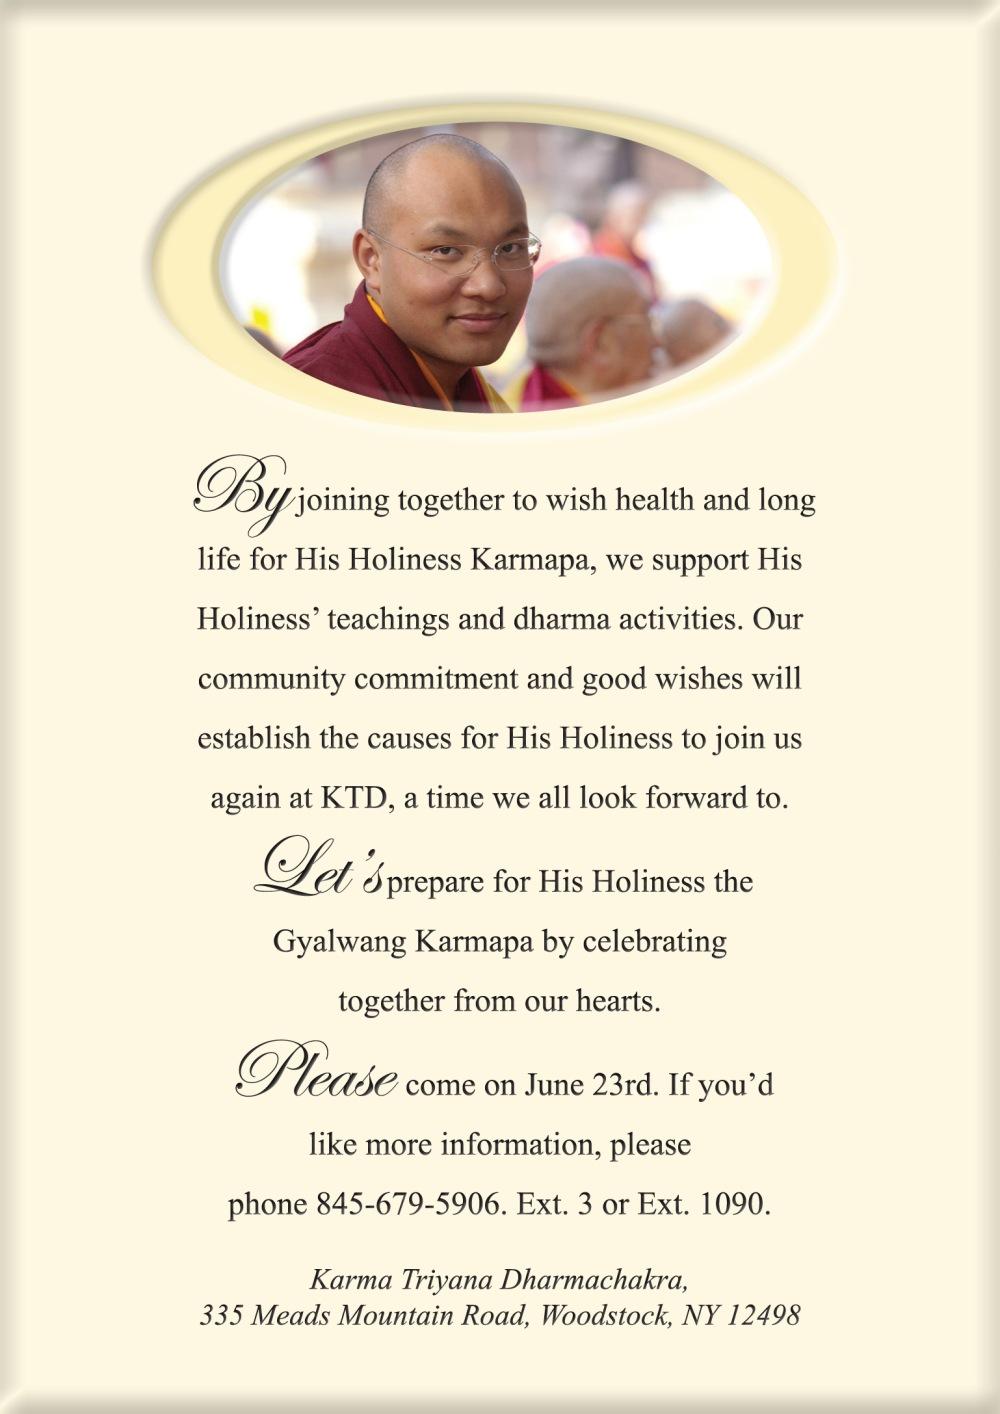 KTD 2013 Karmapa BD party invitation-3orig